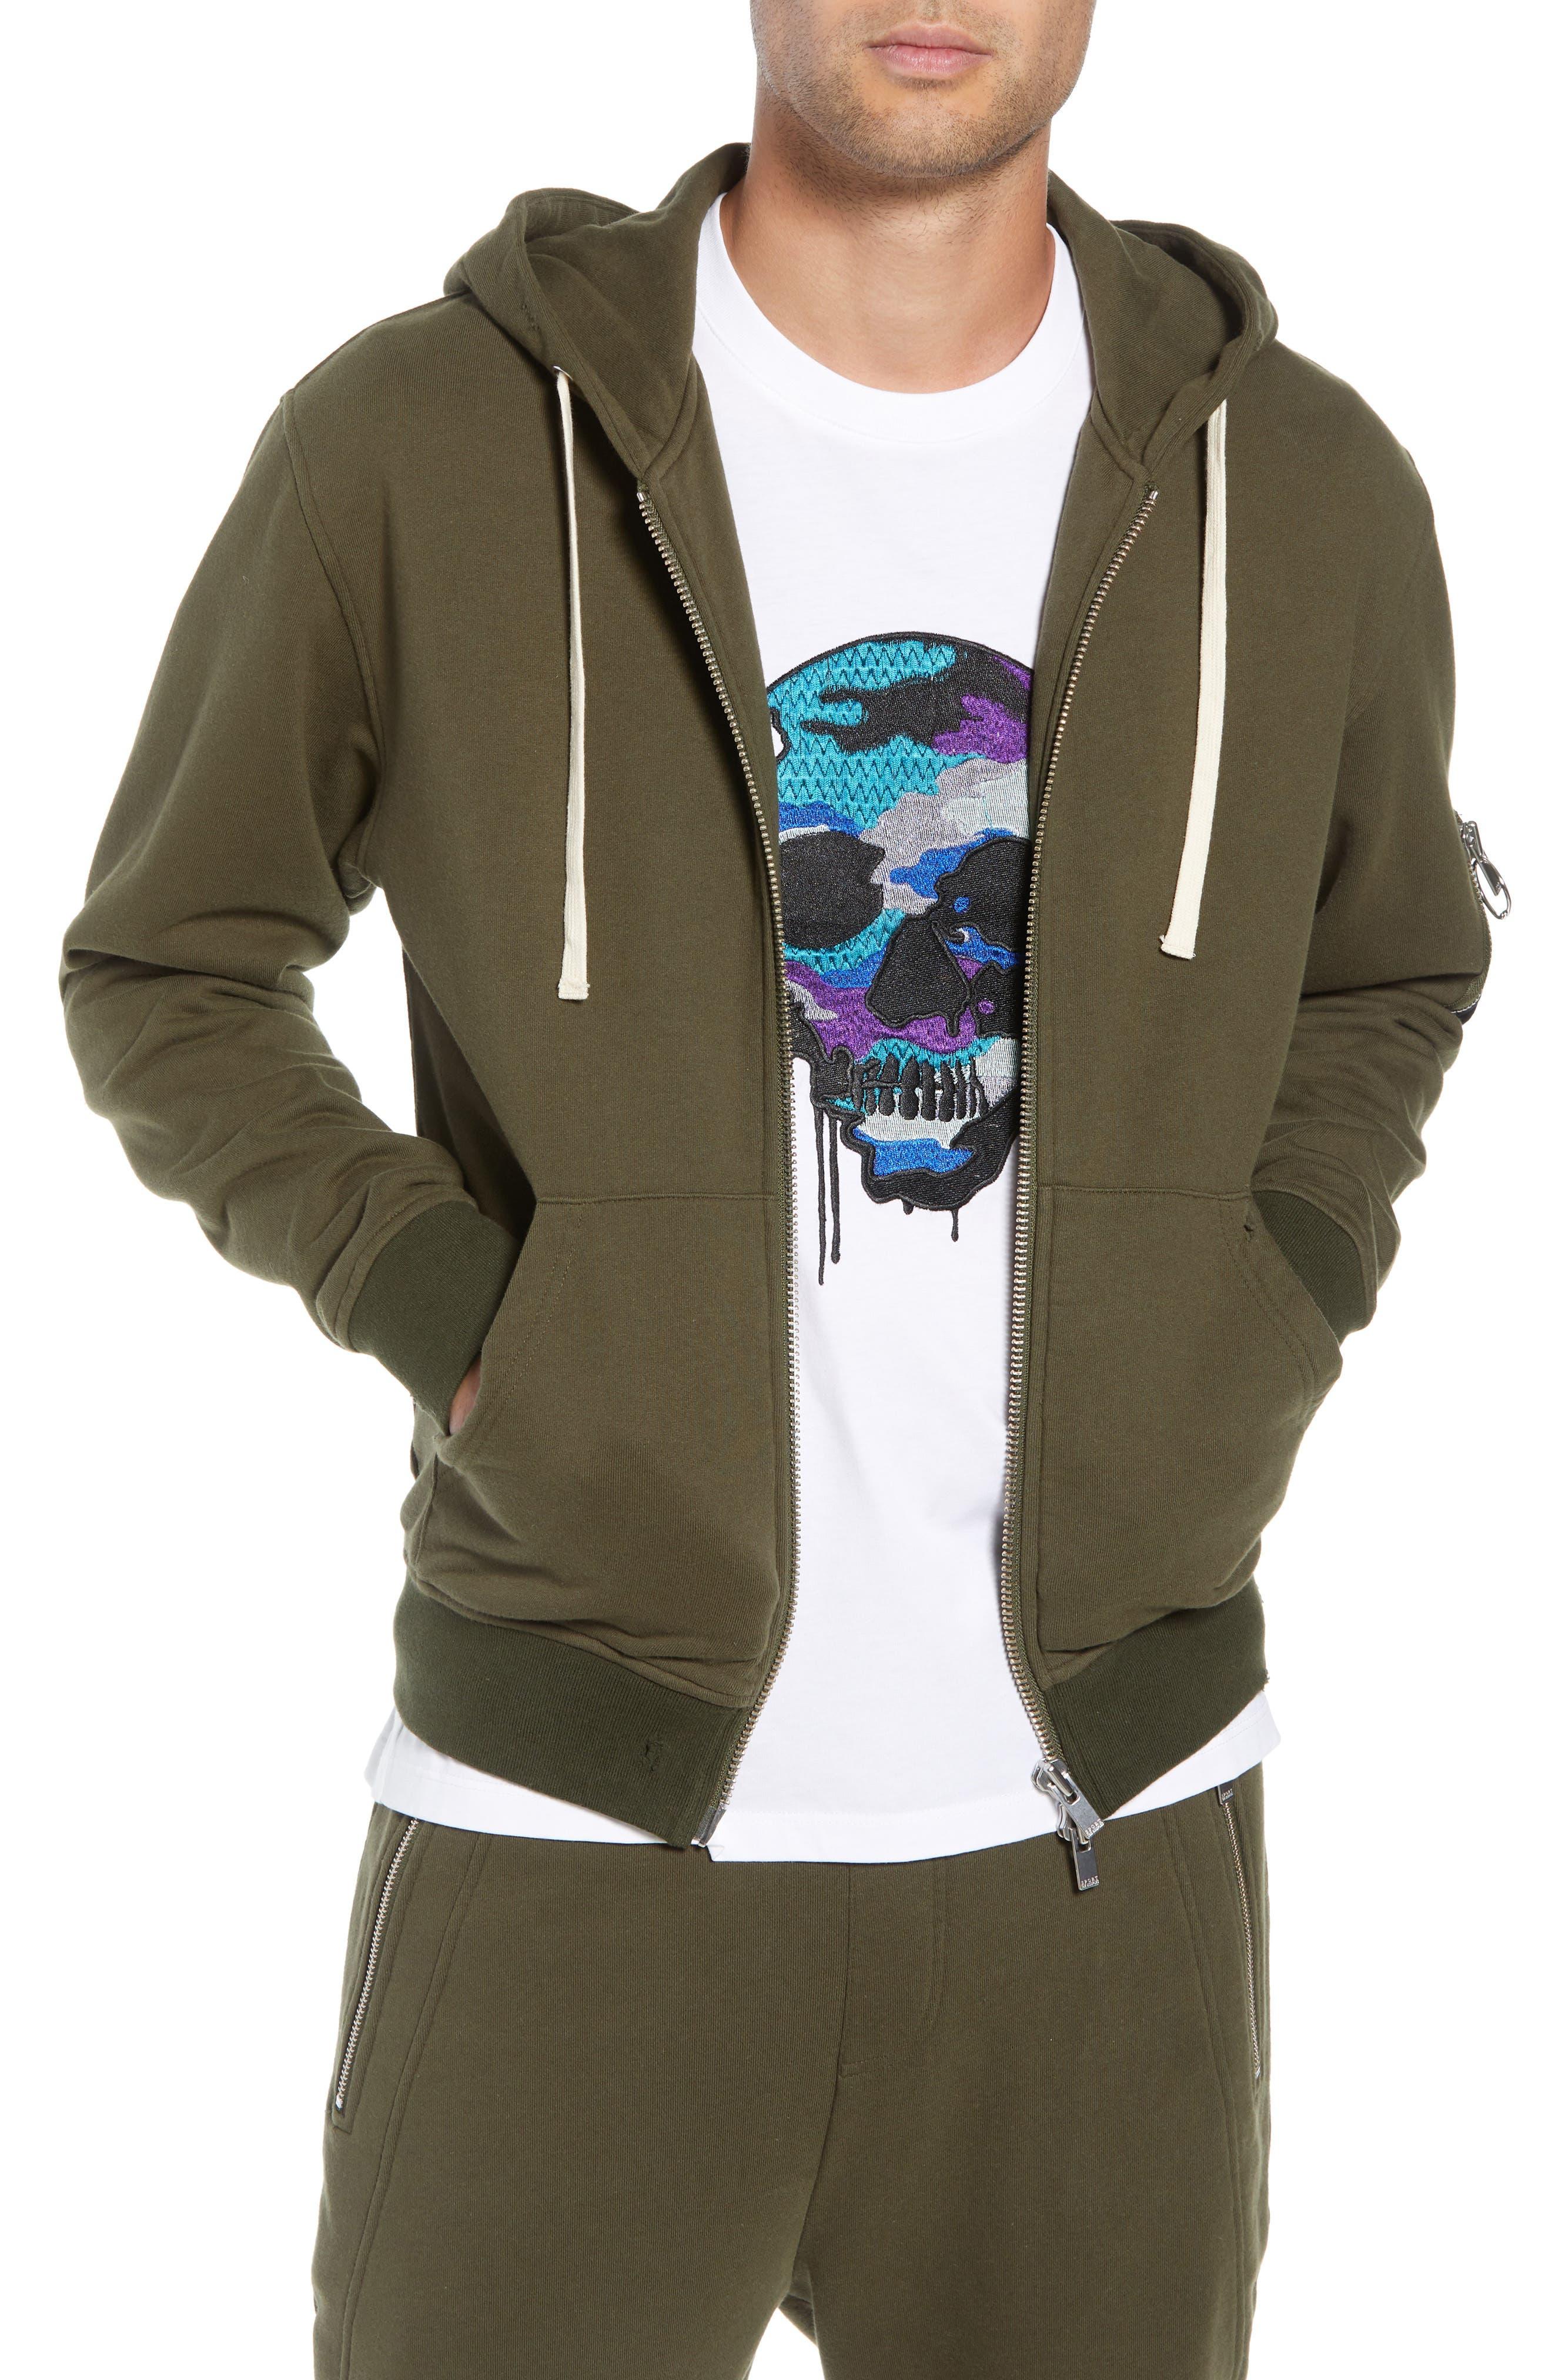 THE KOOPLES Distressed Zip Front Hooded Sweatshirt in Khaki